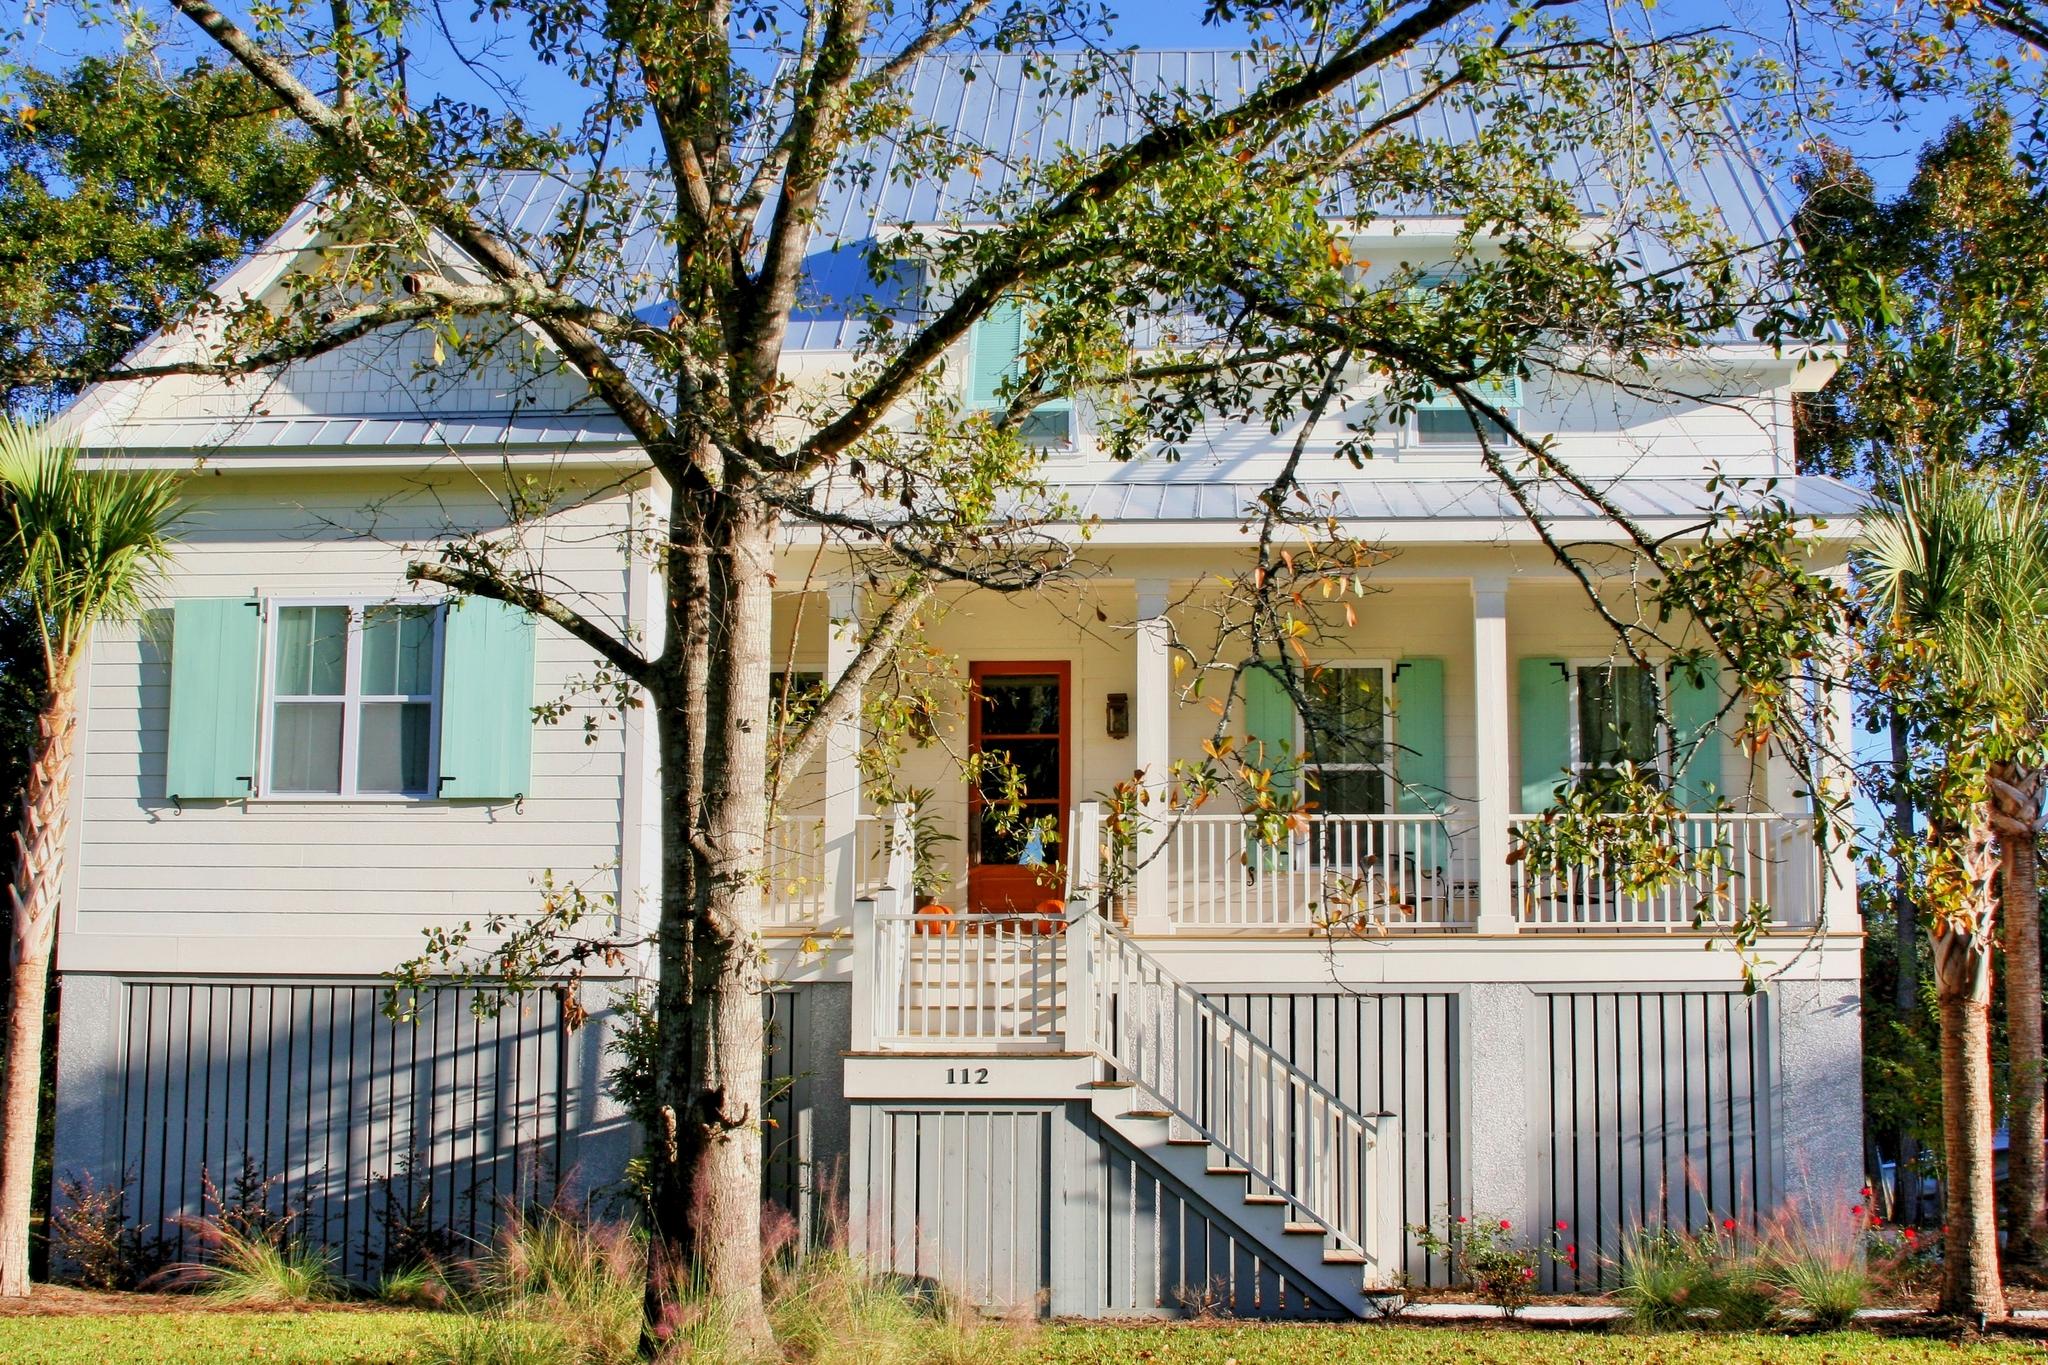 Awendaw Creek Flatfish Island Designs Coastal Home Plans